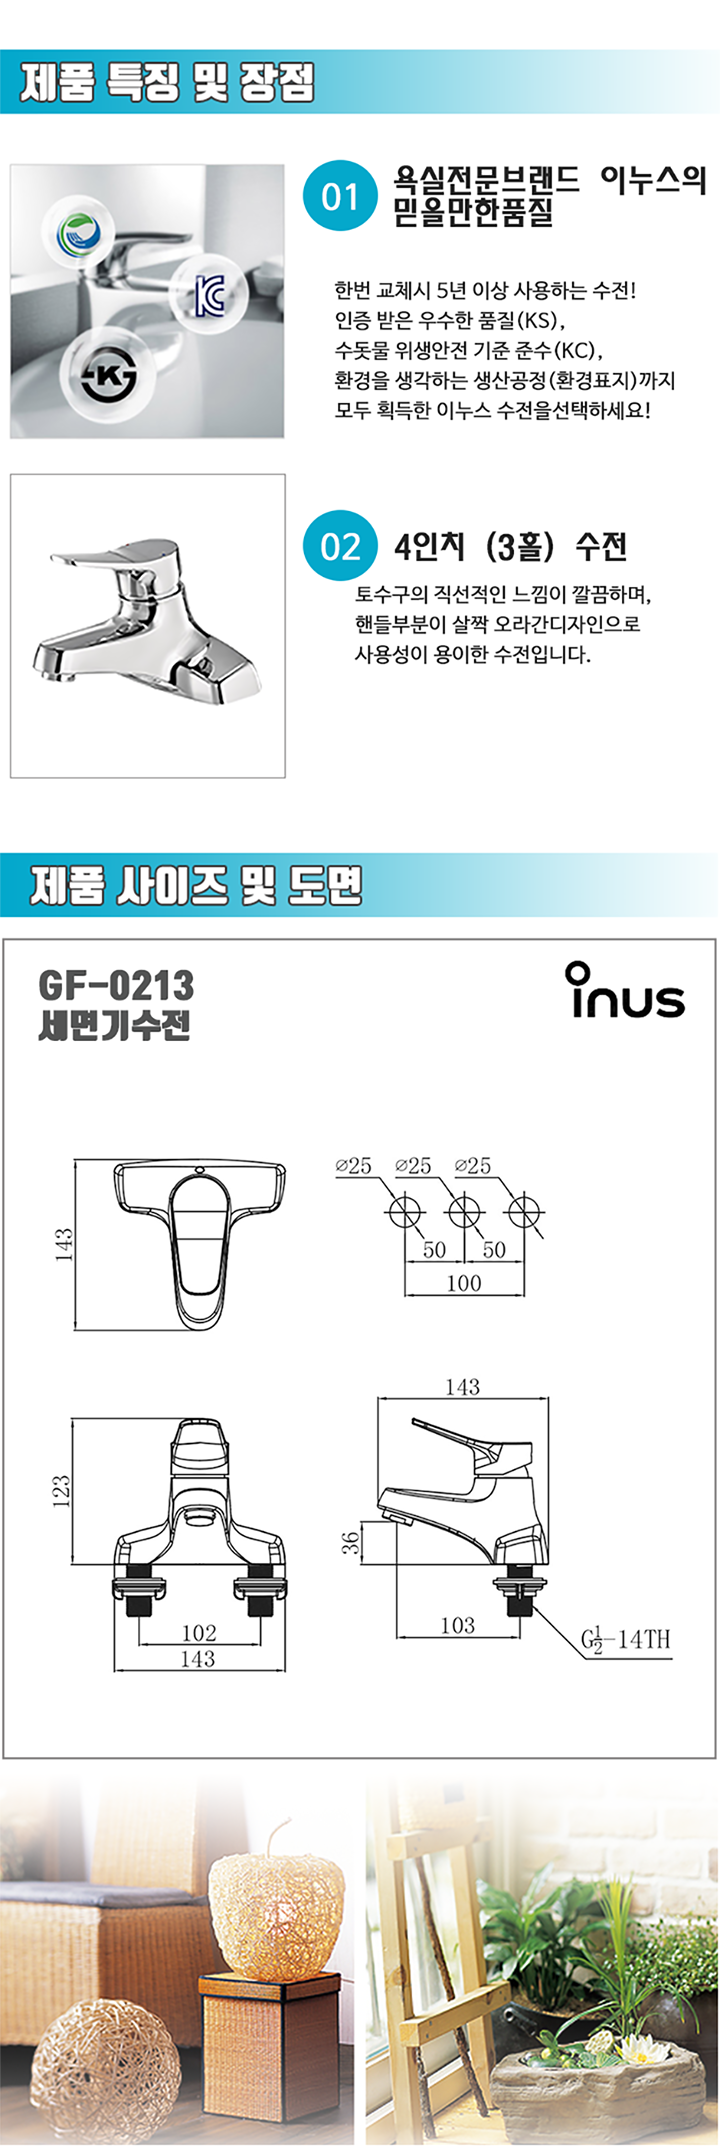 GF0213-720-2CP.png